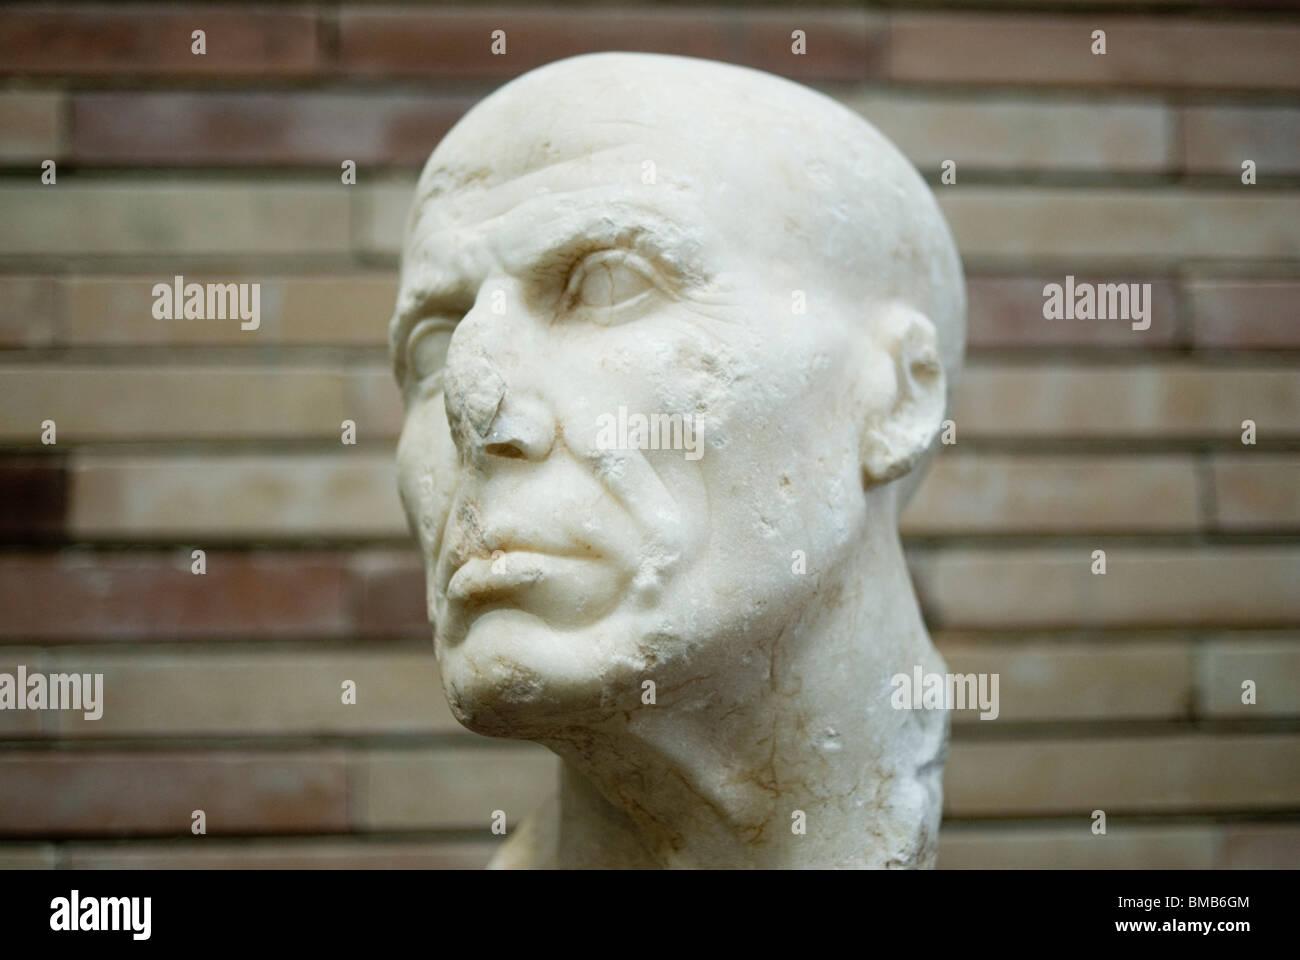 Retrato de un hombre. Ist C. BC. Museo Nacional de Arte Romano de Mérida. Extremadura. España. Imagen De Stock